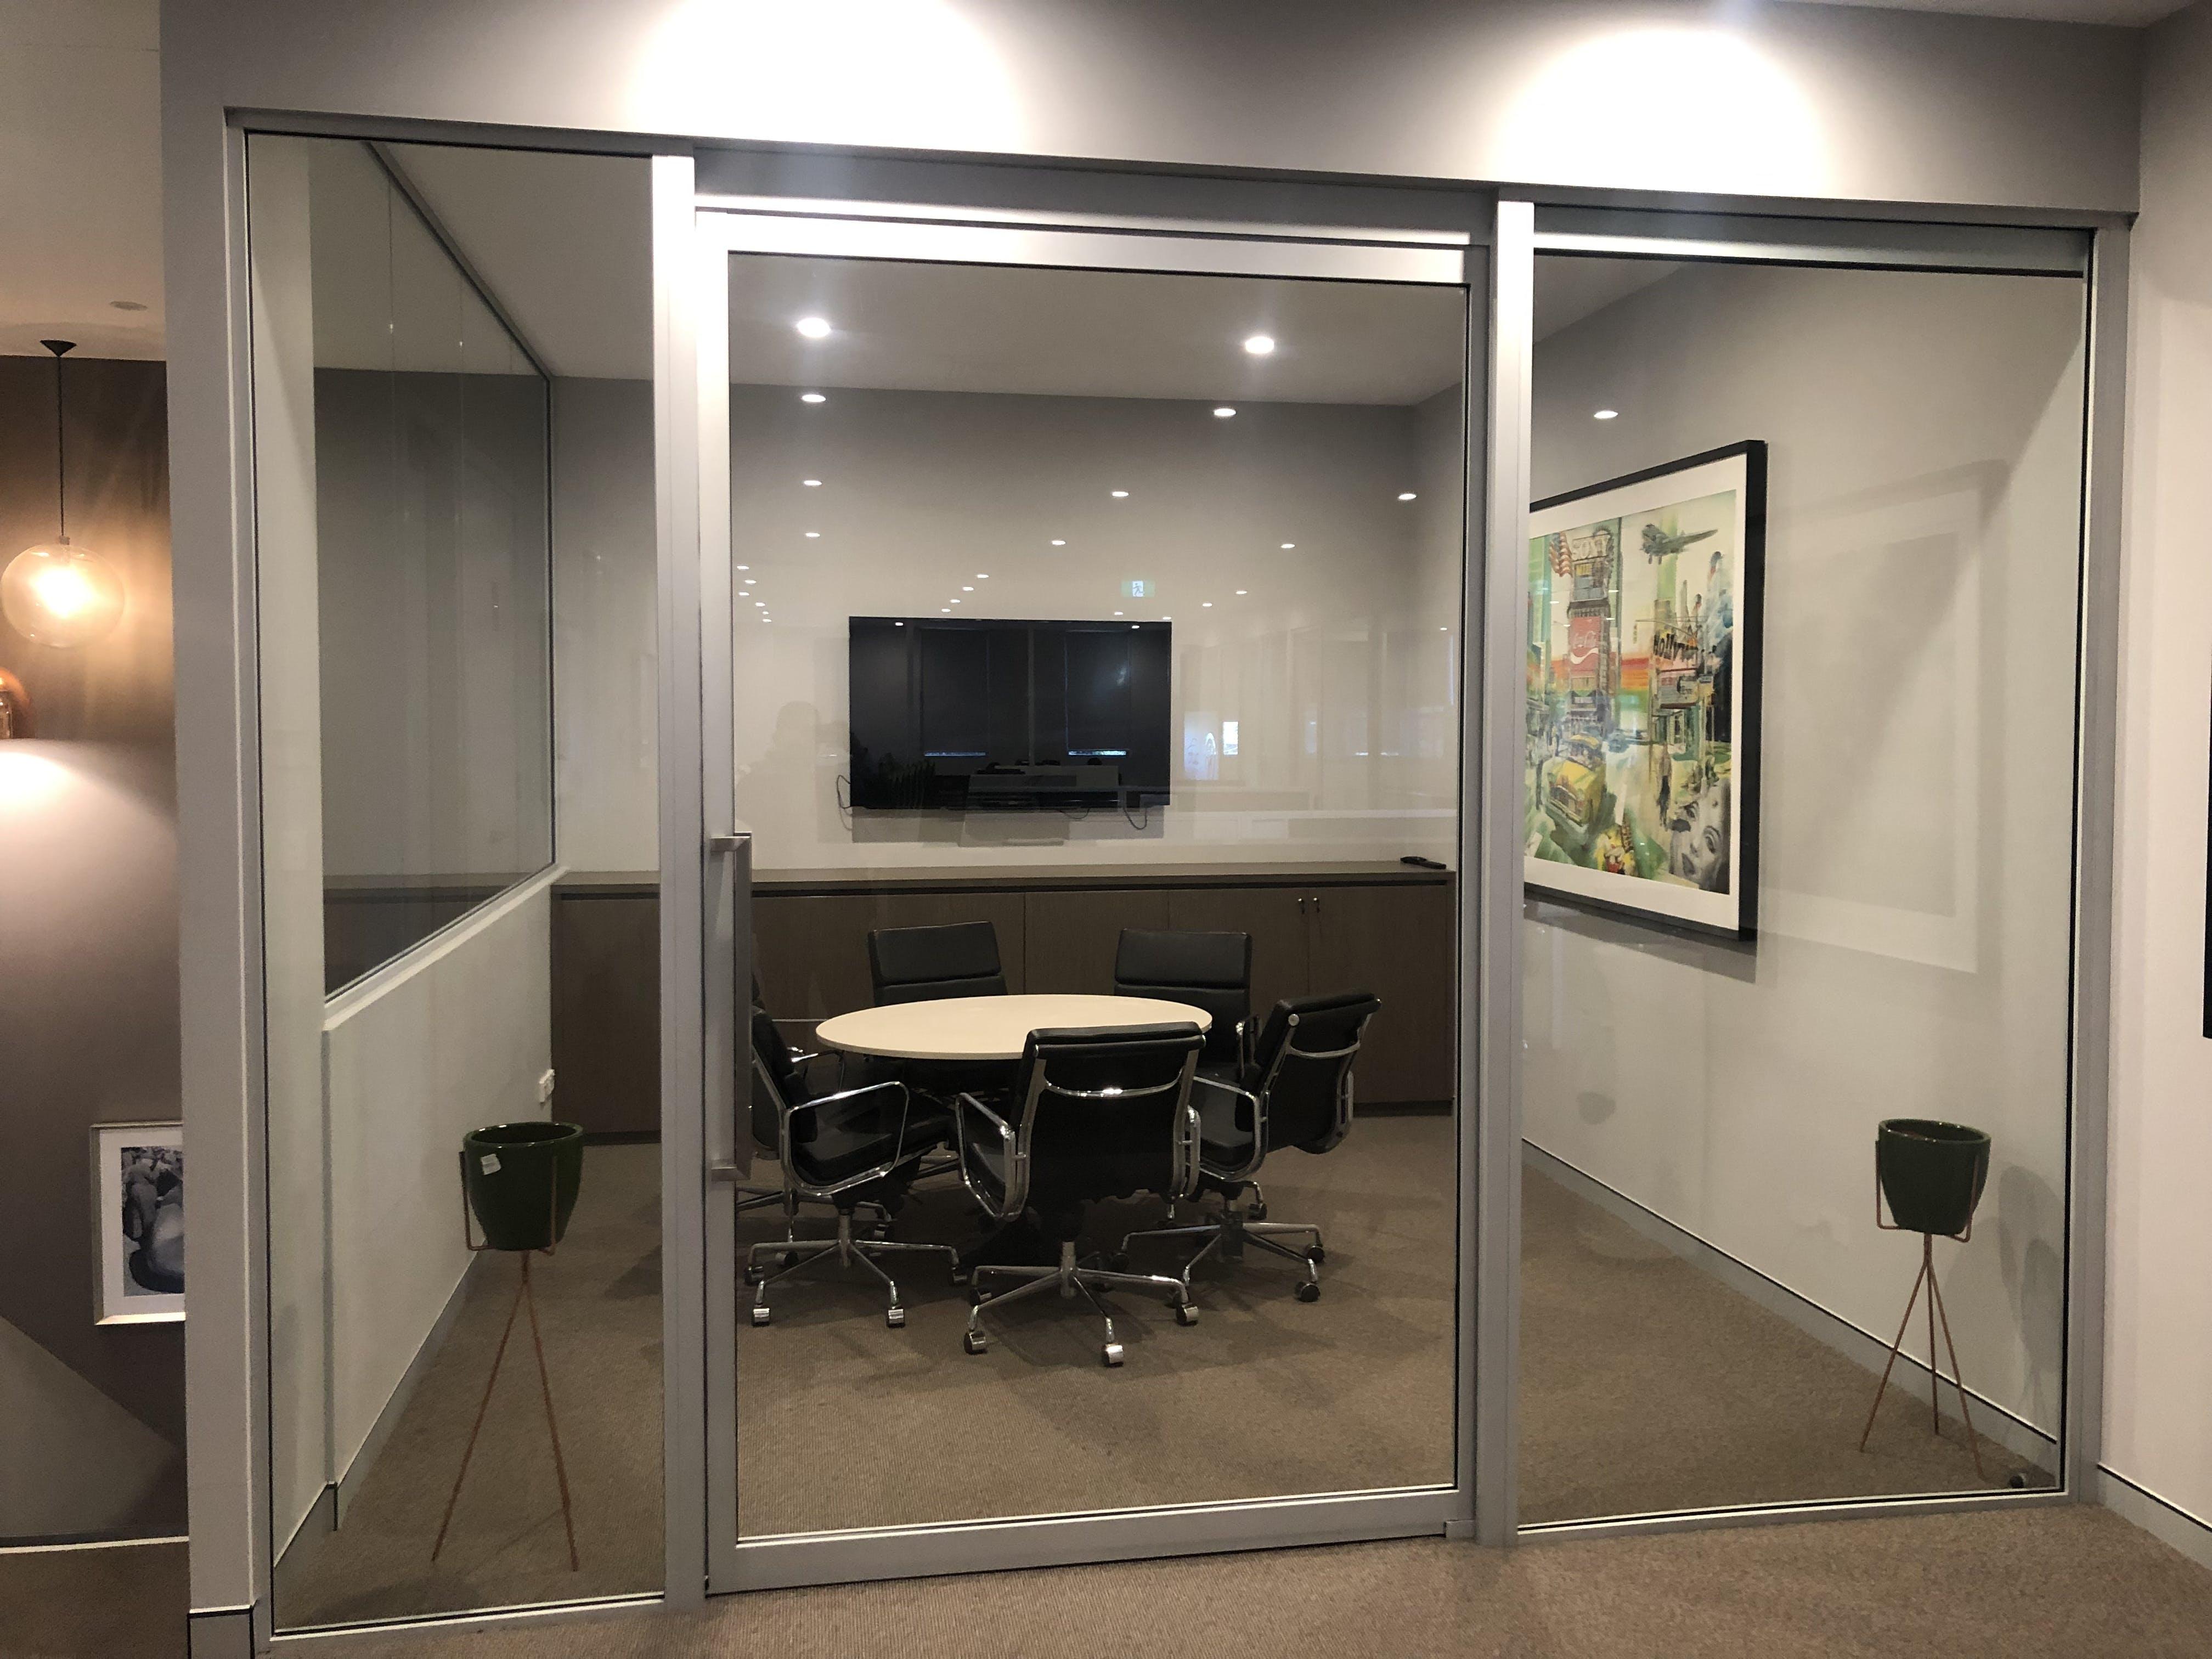 Bugatti, meeting room at Meeting Room, image 1